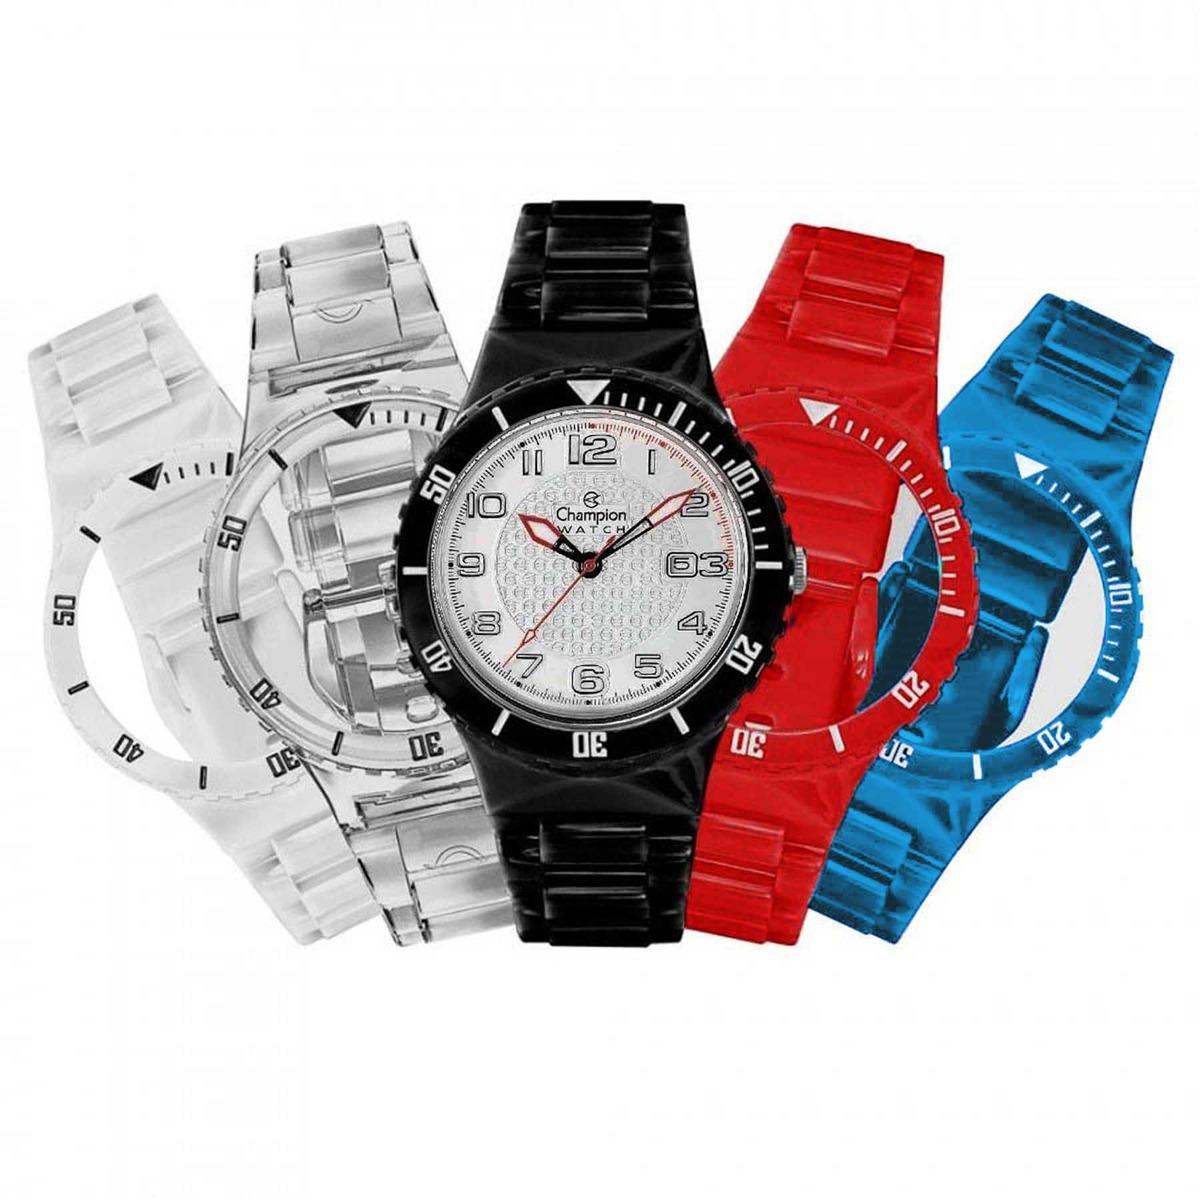 3b8f33cd95b relógio champion troca pulseiras unissex kit com 5 pulseiras. Carregando  zoom.